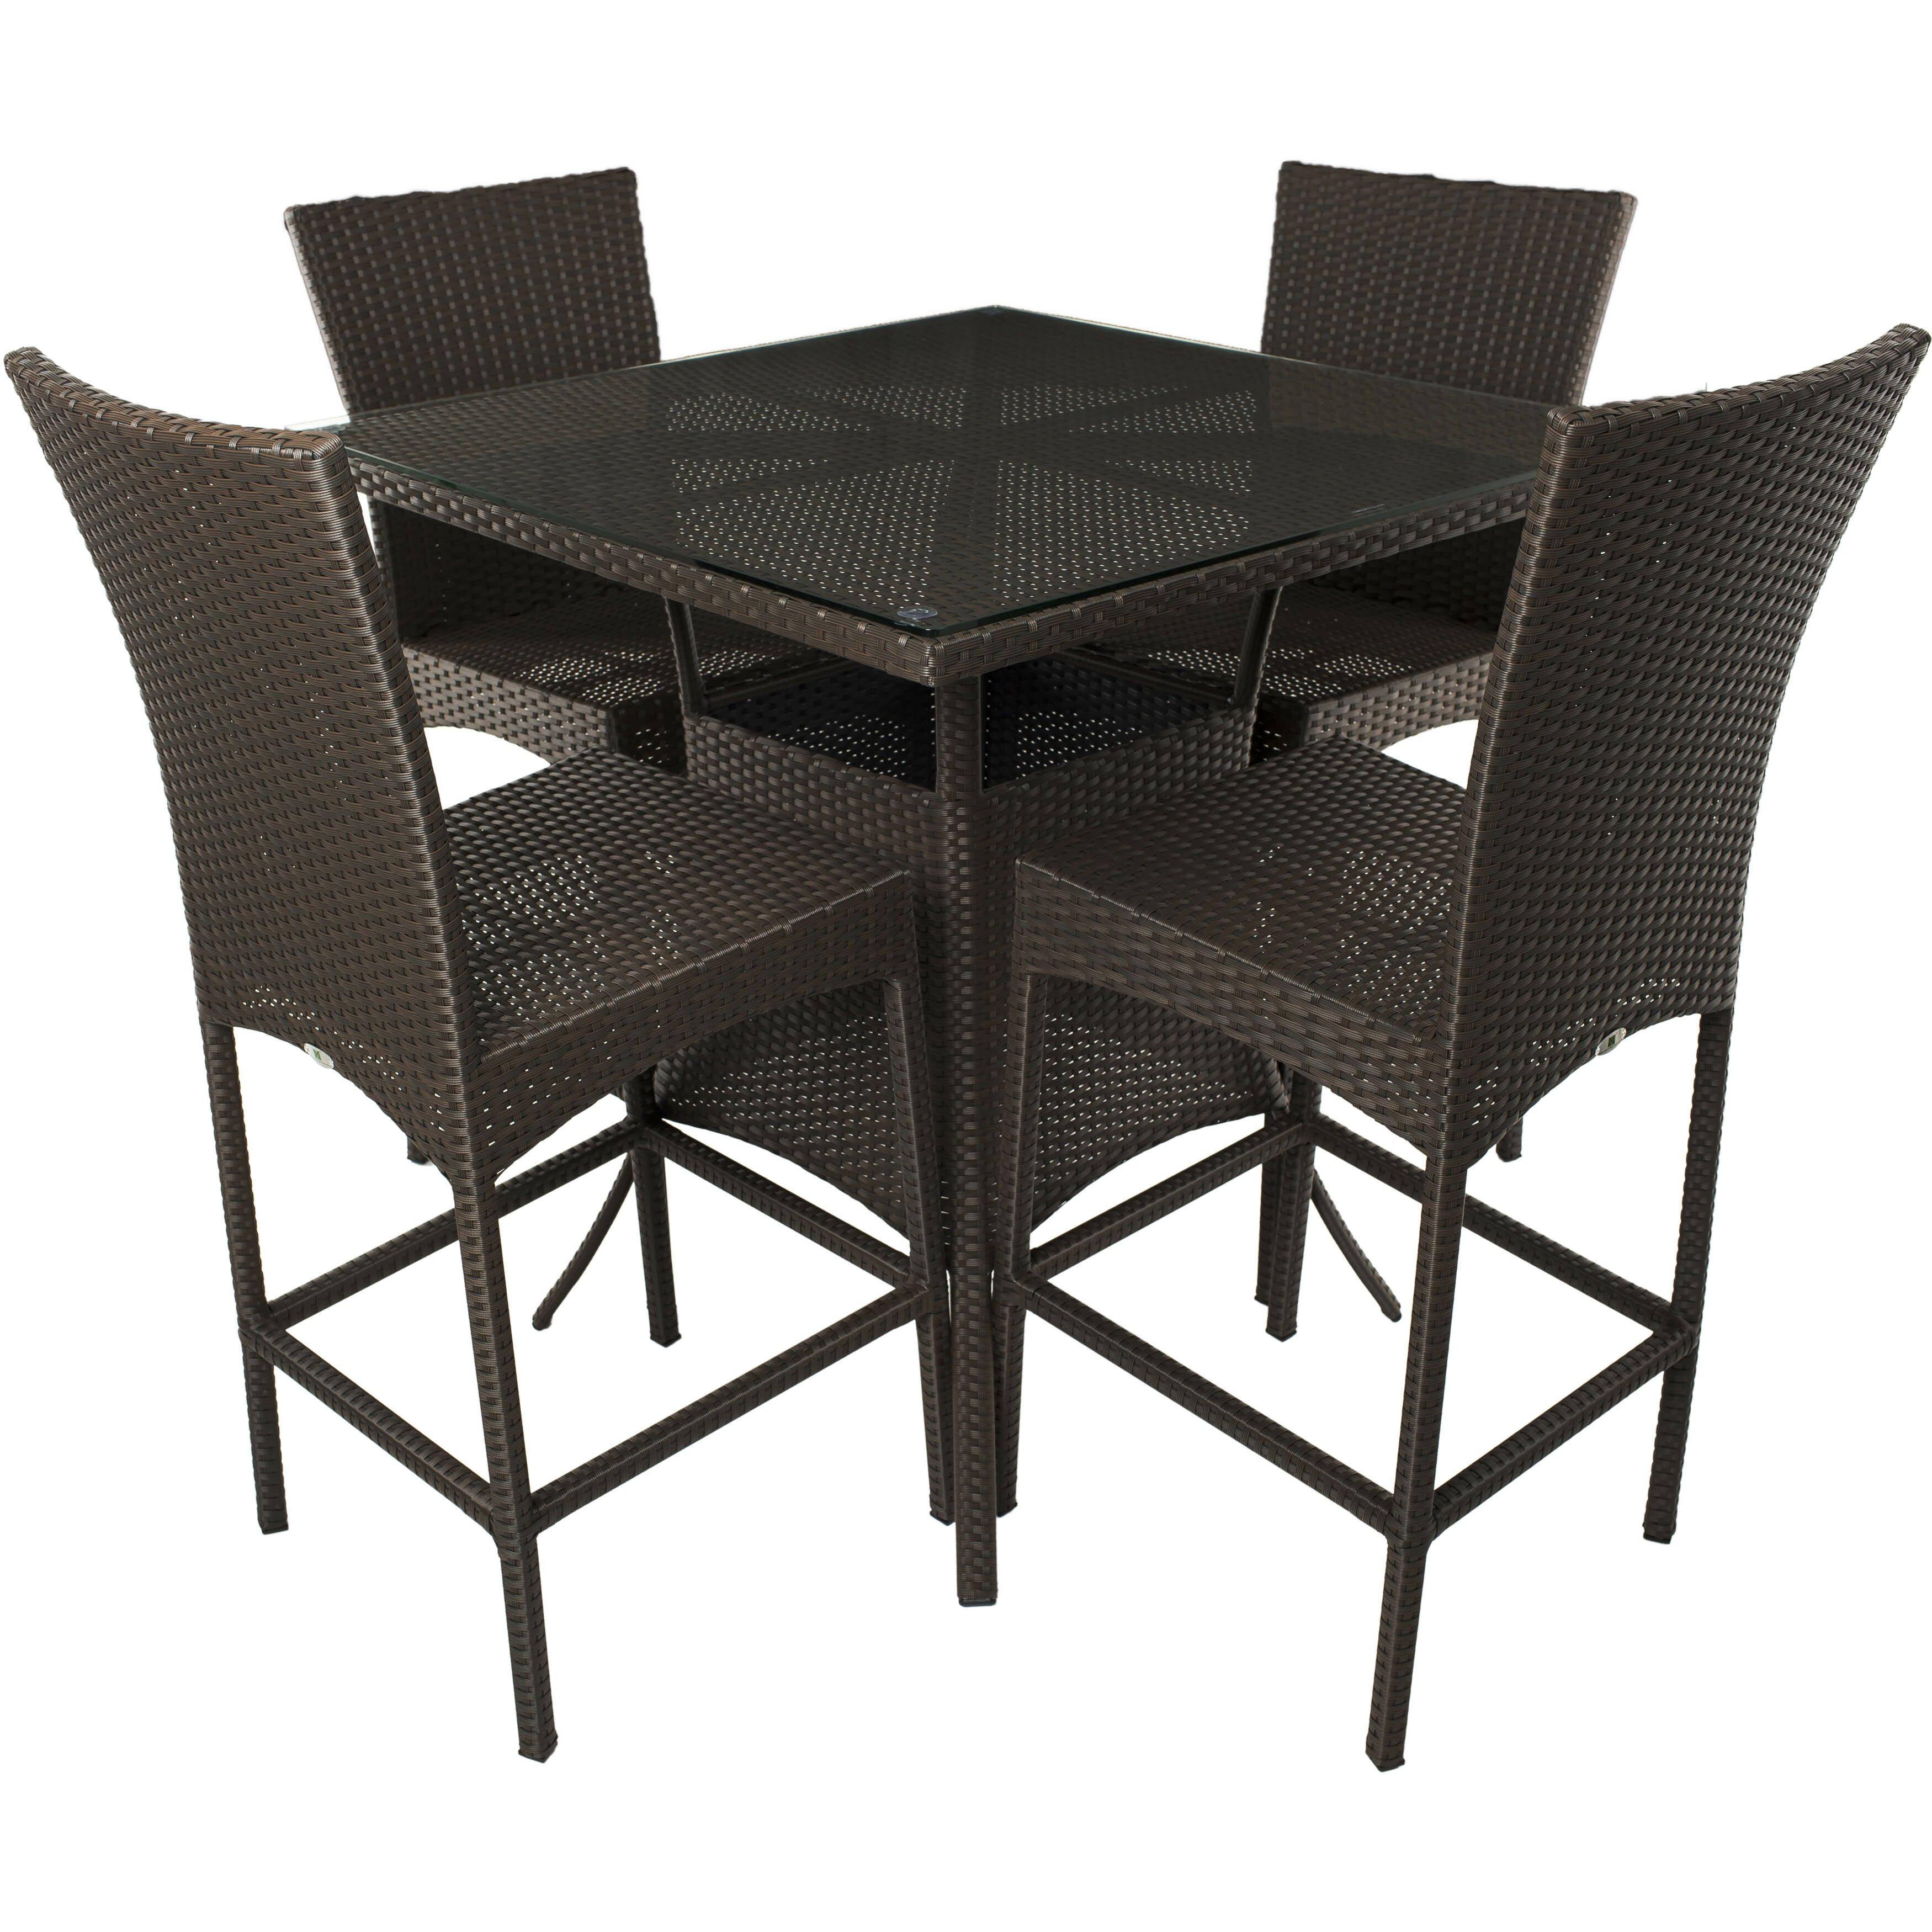 matrix 5 piece pub table set. Black Bedroom Furniture Sets. Home Design Ideas